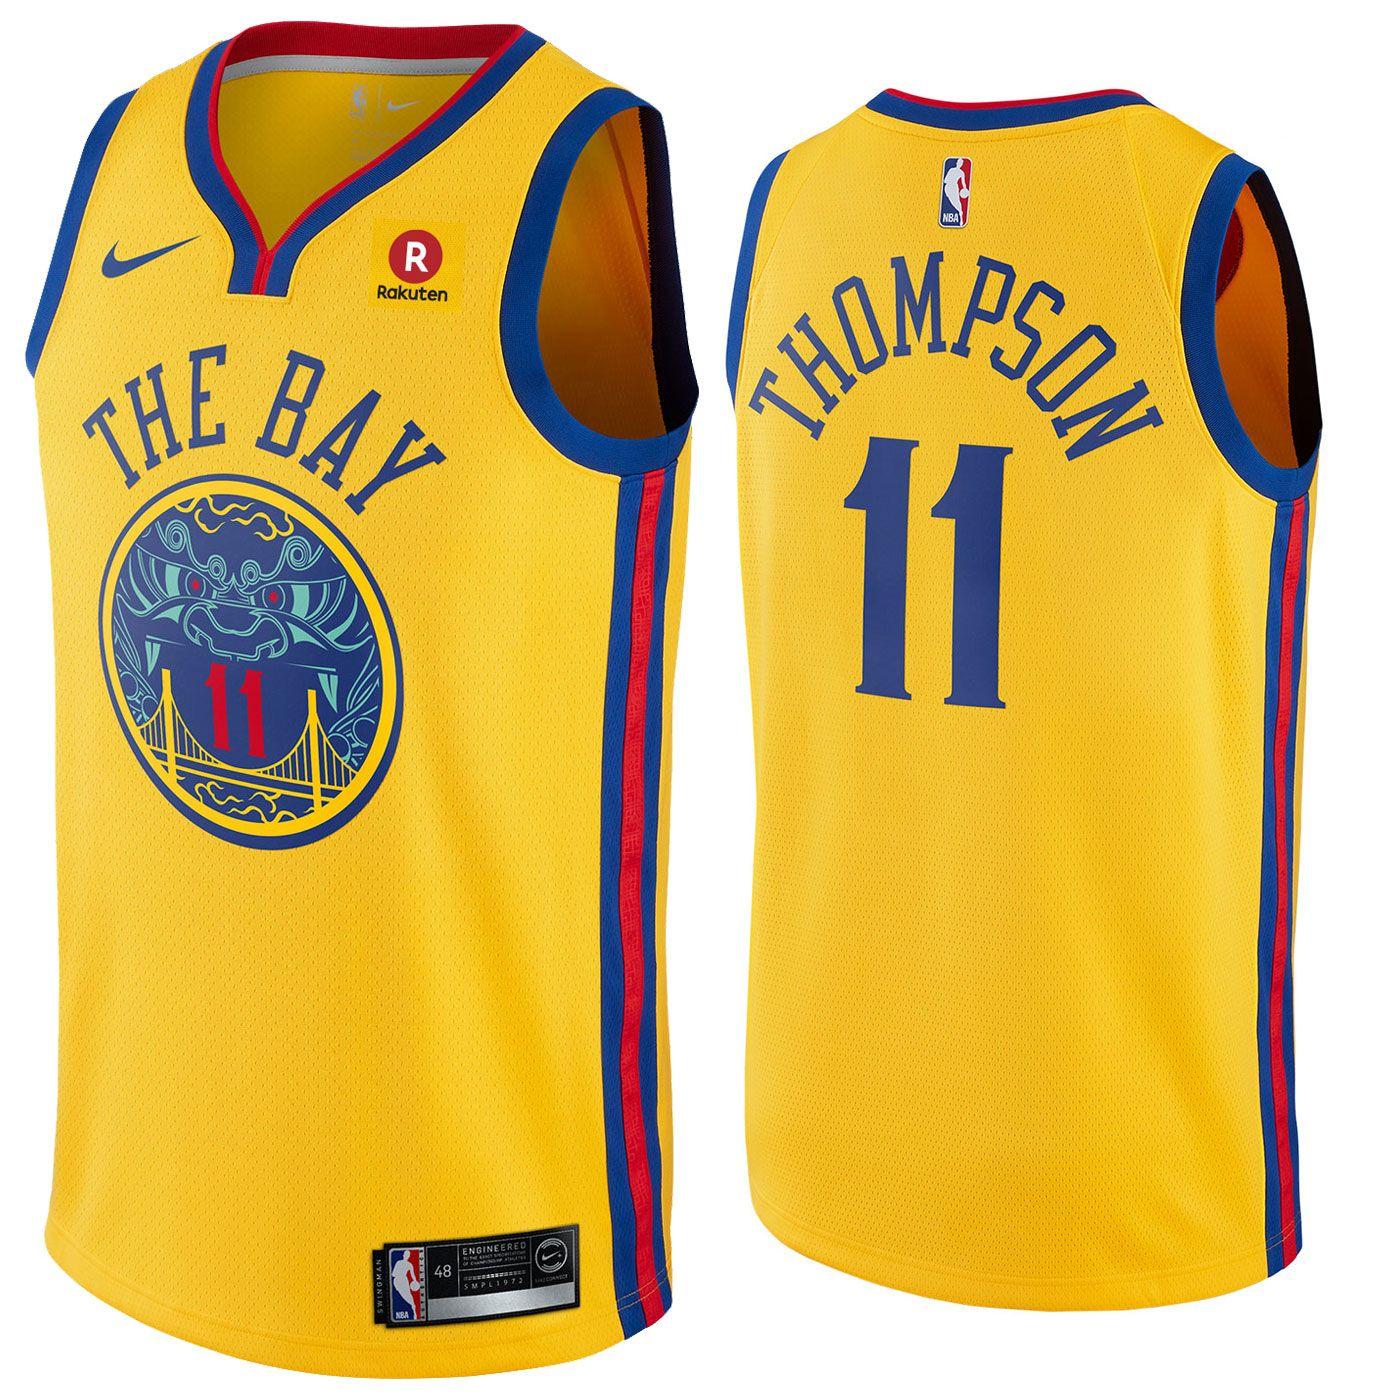 dba79eea204 Golden State Warriors Nike Dri-FIT Men s Chinese Heritage Klay Thompson  11  Swingman City